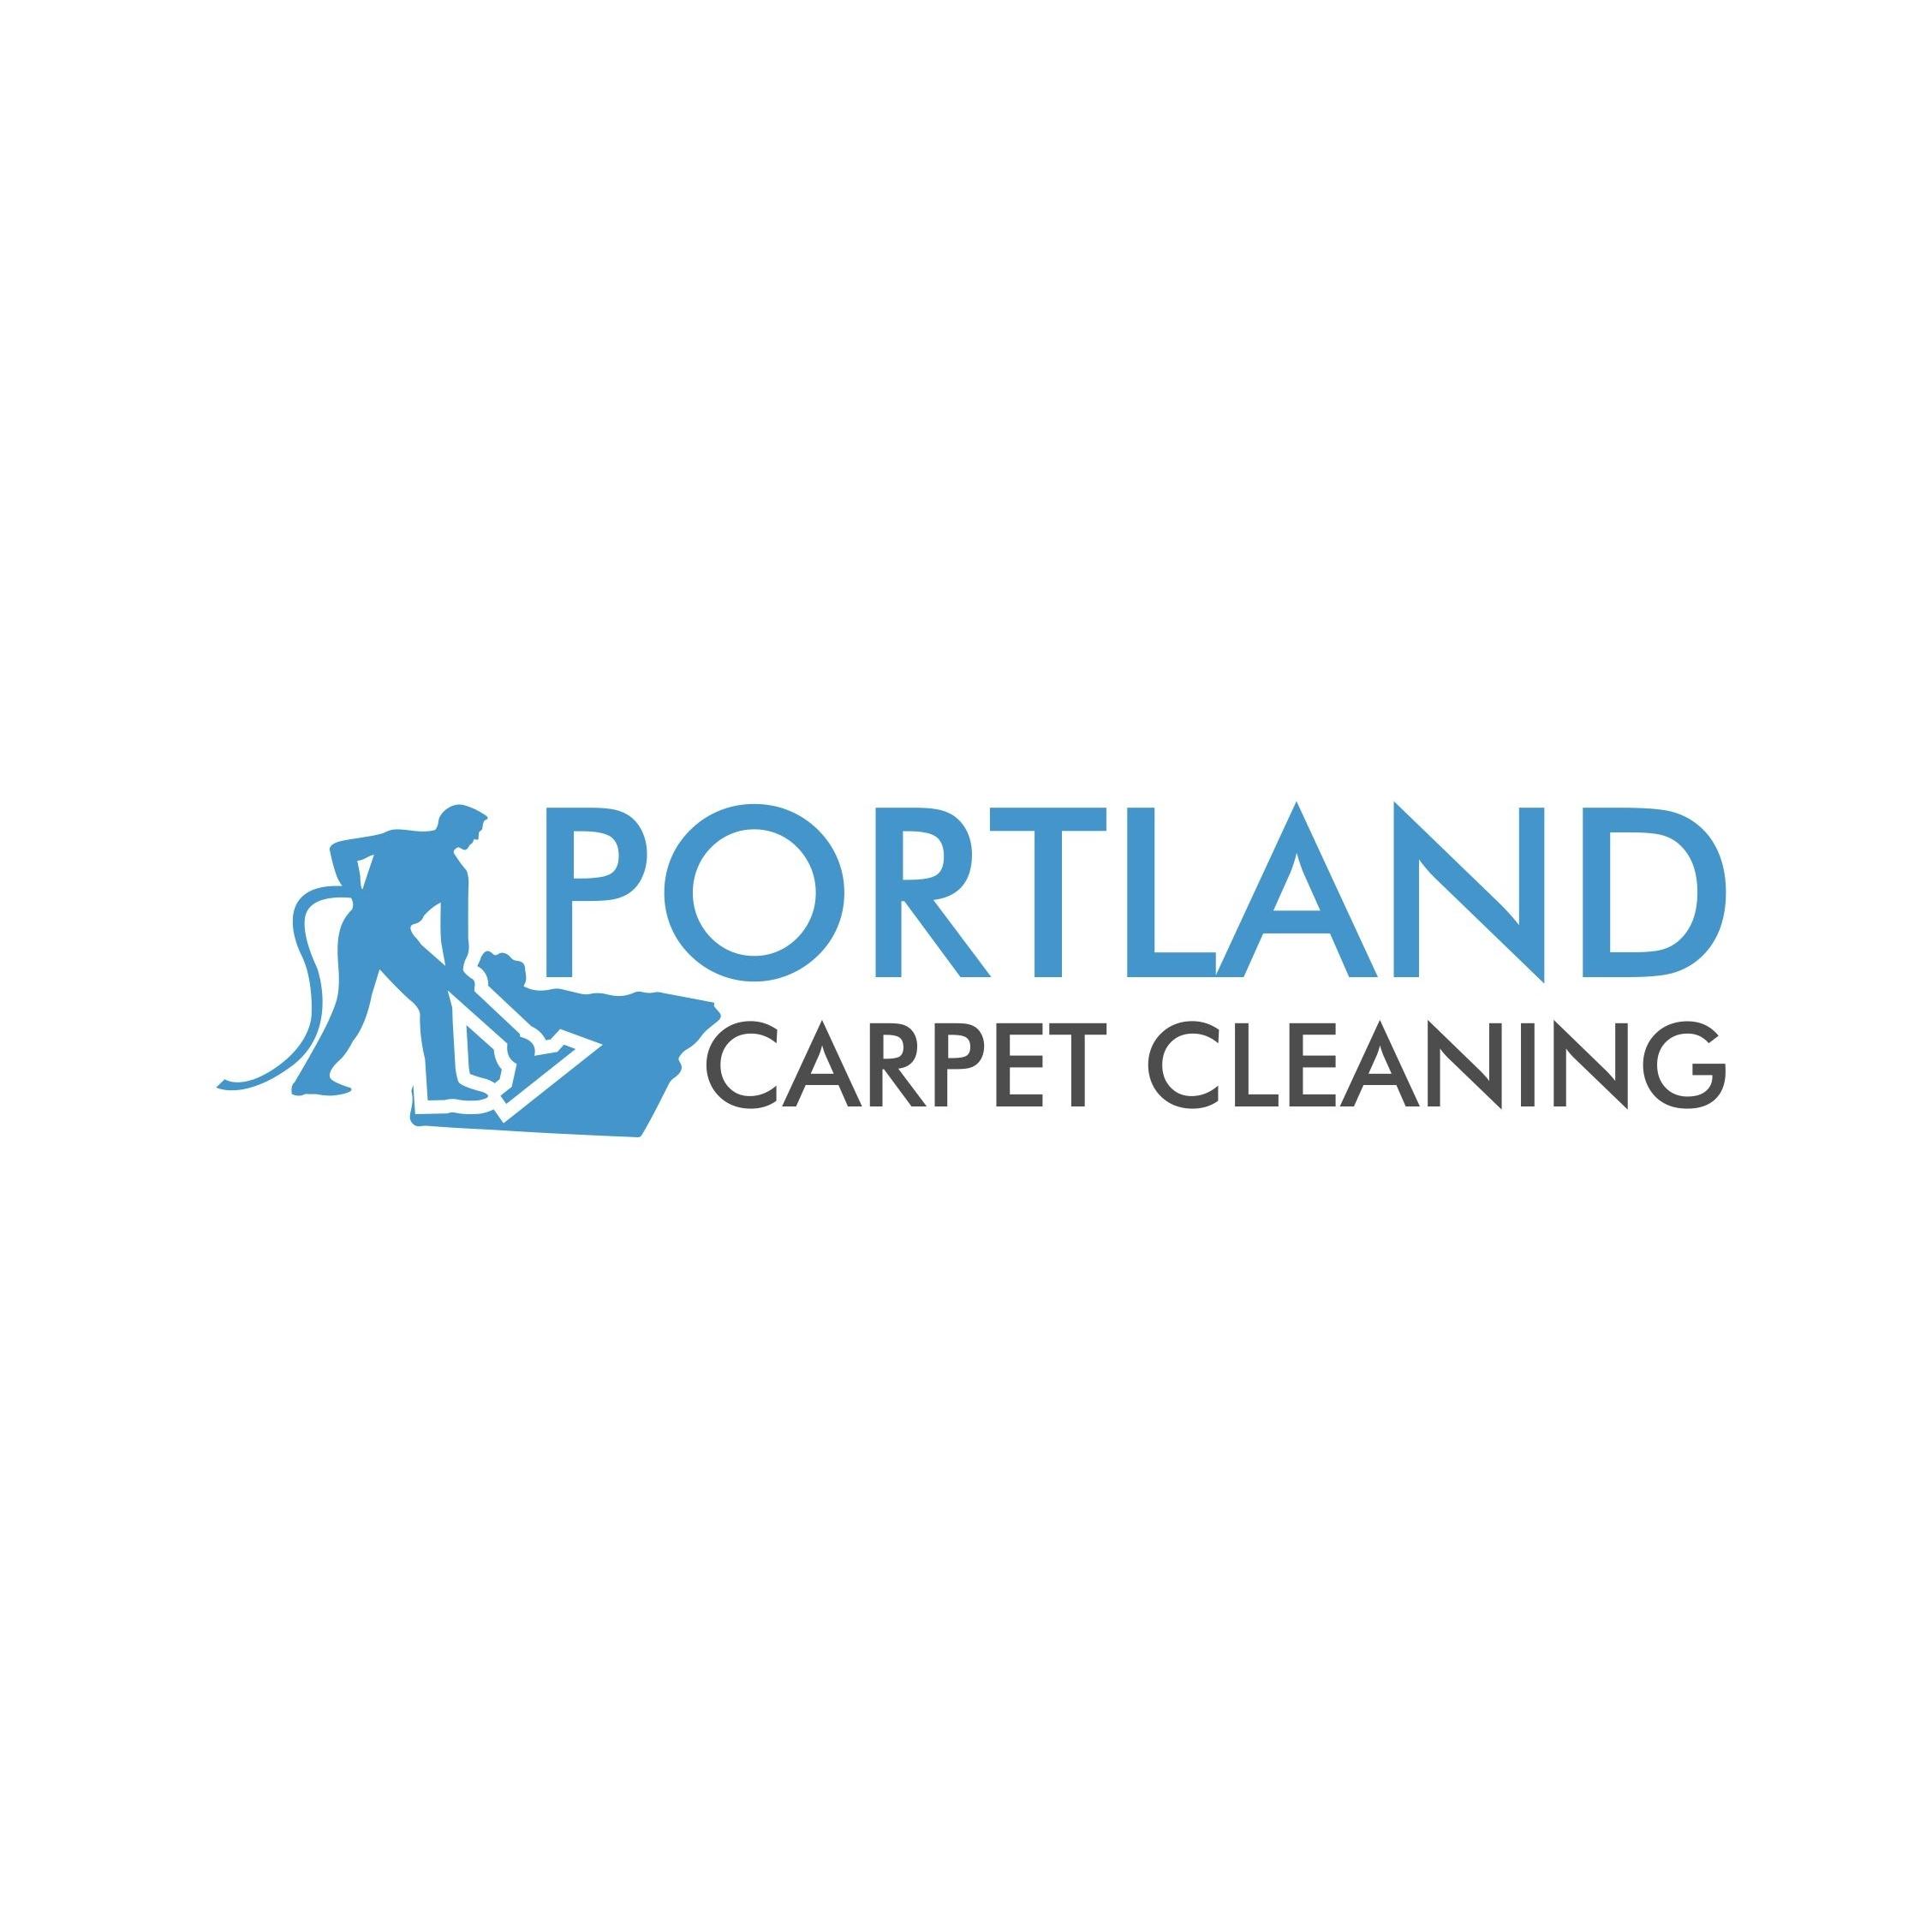 Portland Carpet Cleaning LLC